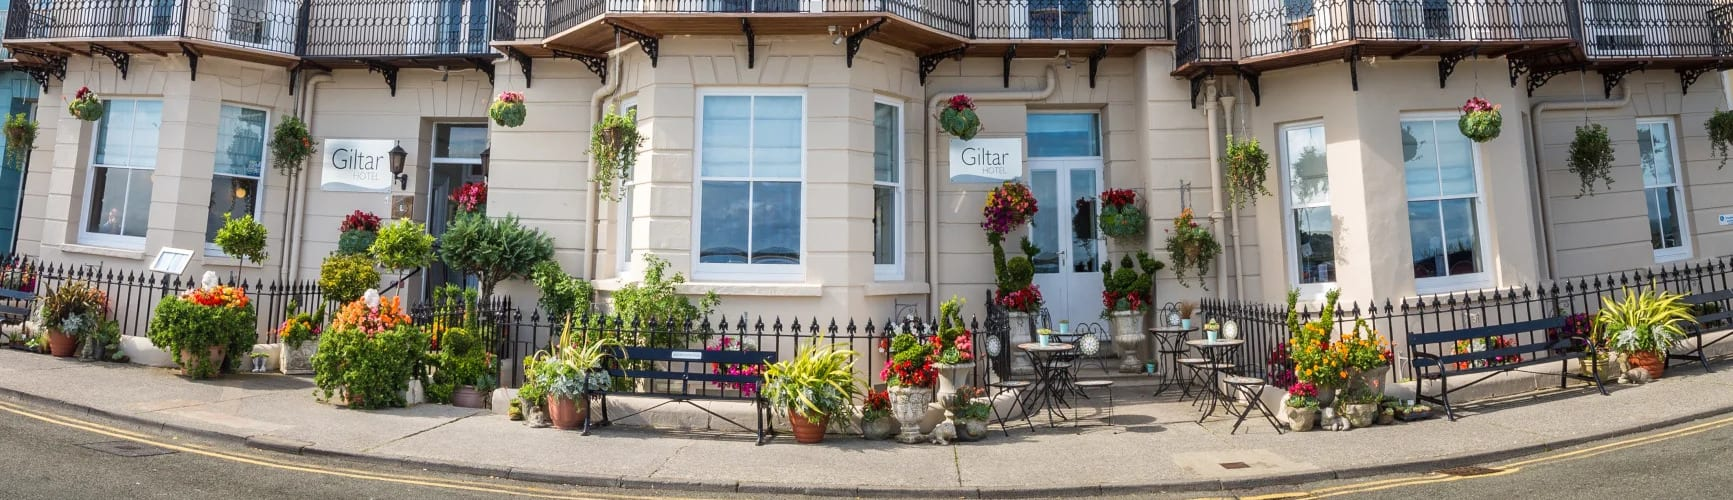 Giltar Hotel - Featured